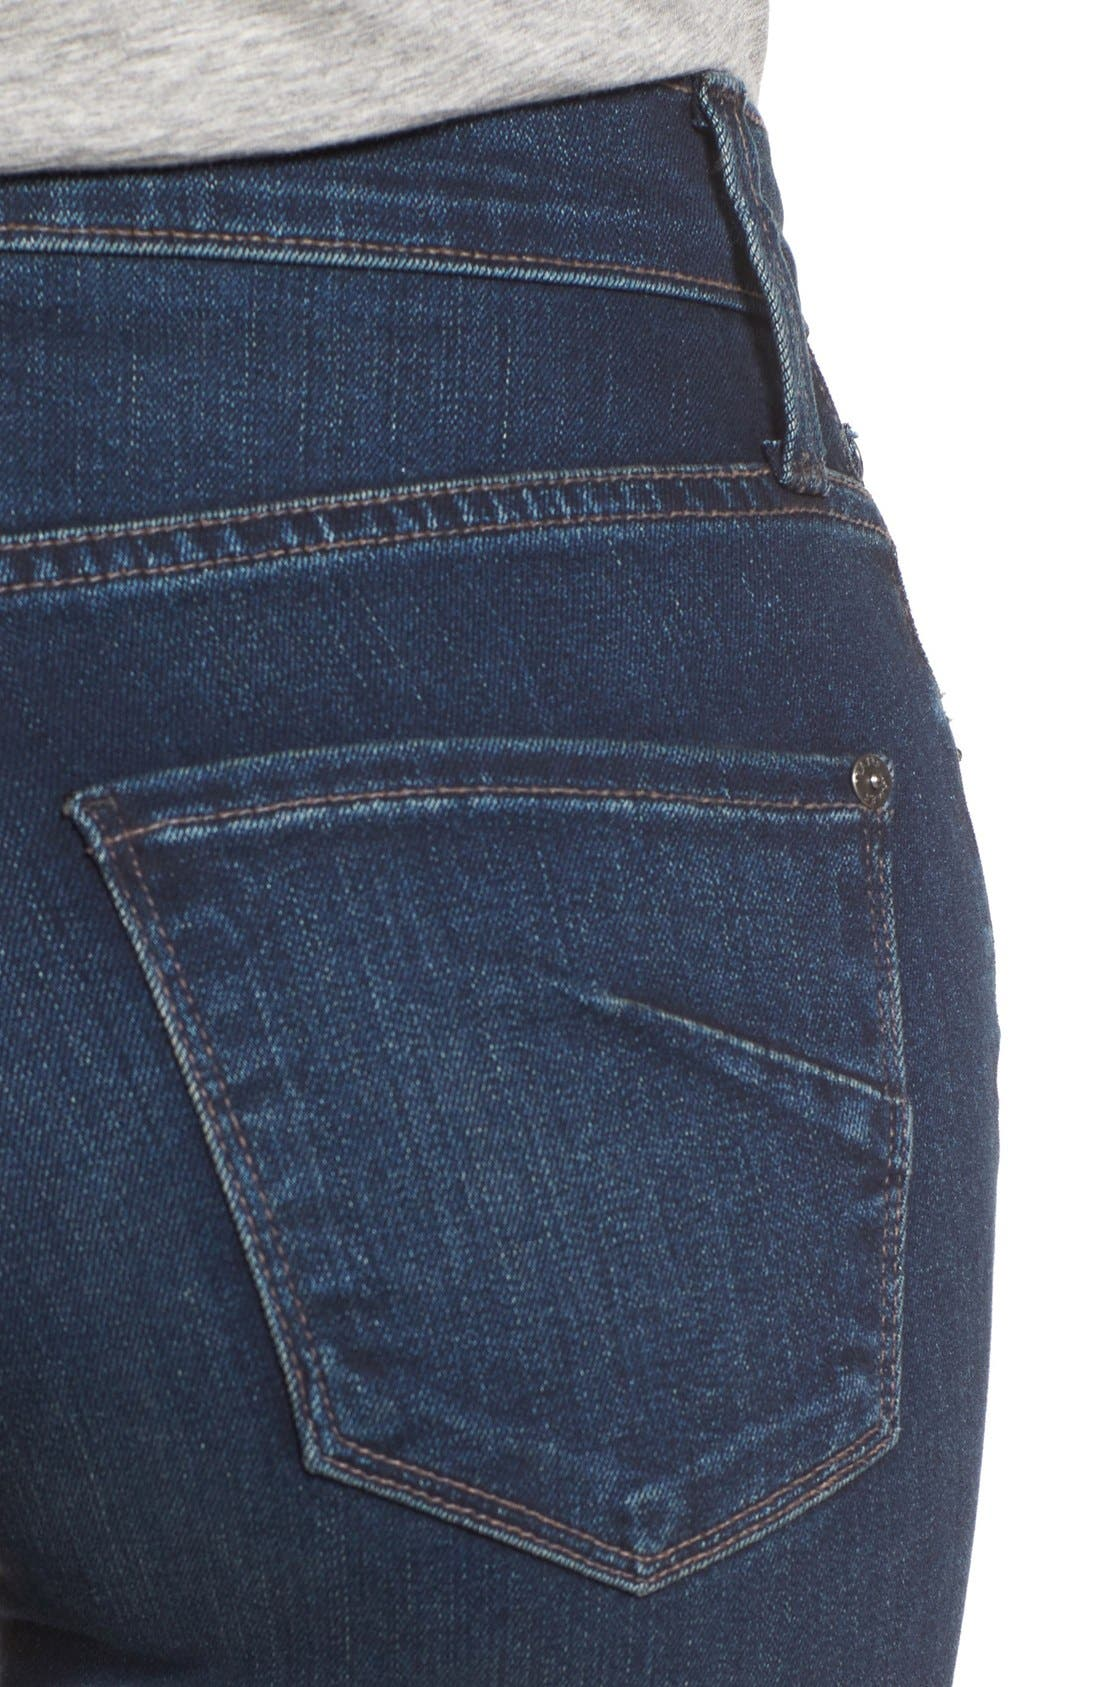 JAMES JEANS,                             'Shayebel' Flare Denim Trousers,                             Alternate thumbnail 4, color,                             401